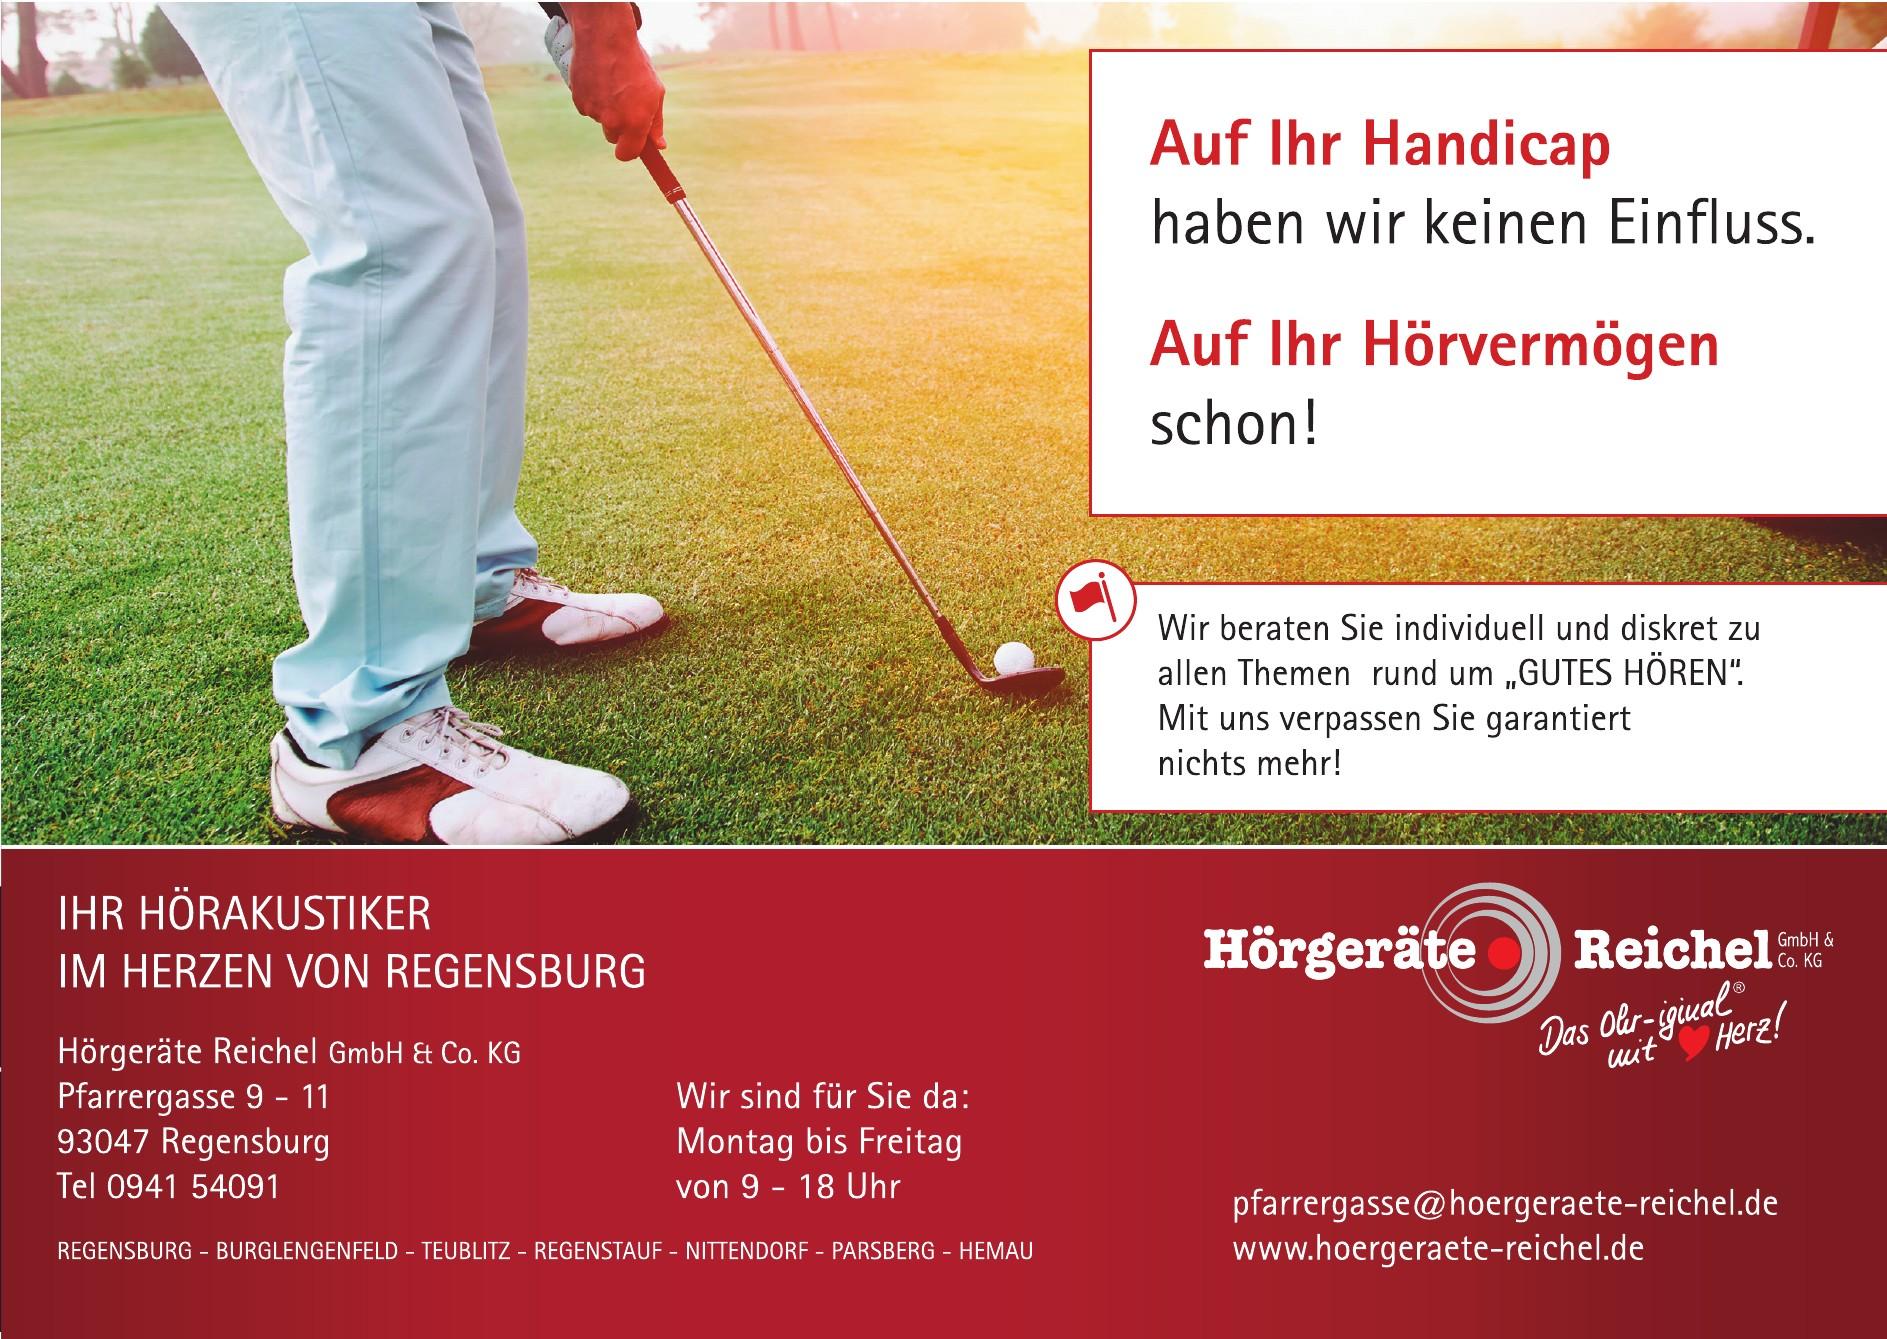 Hörgeräte Reichel GmbH & Co. KG